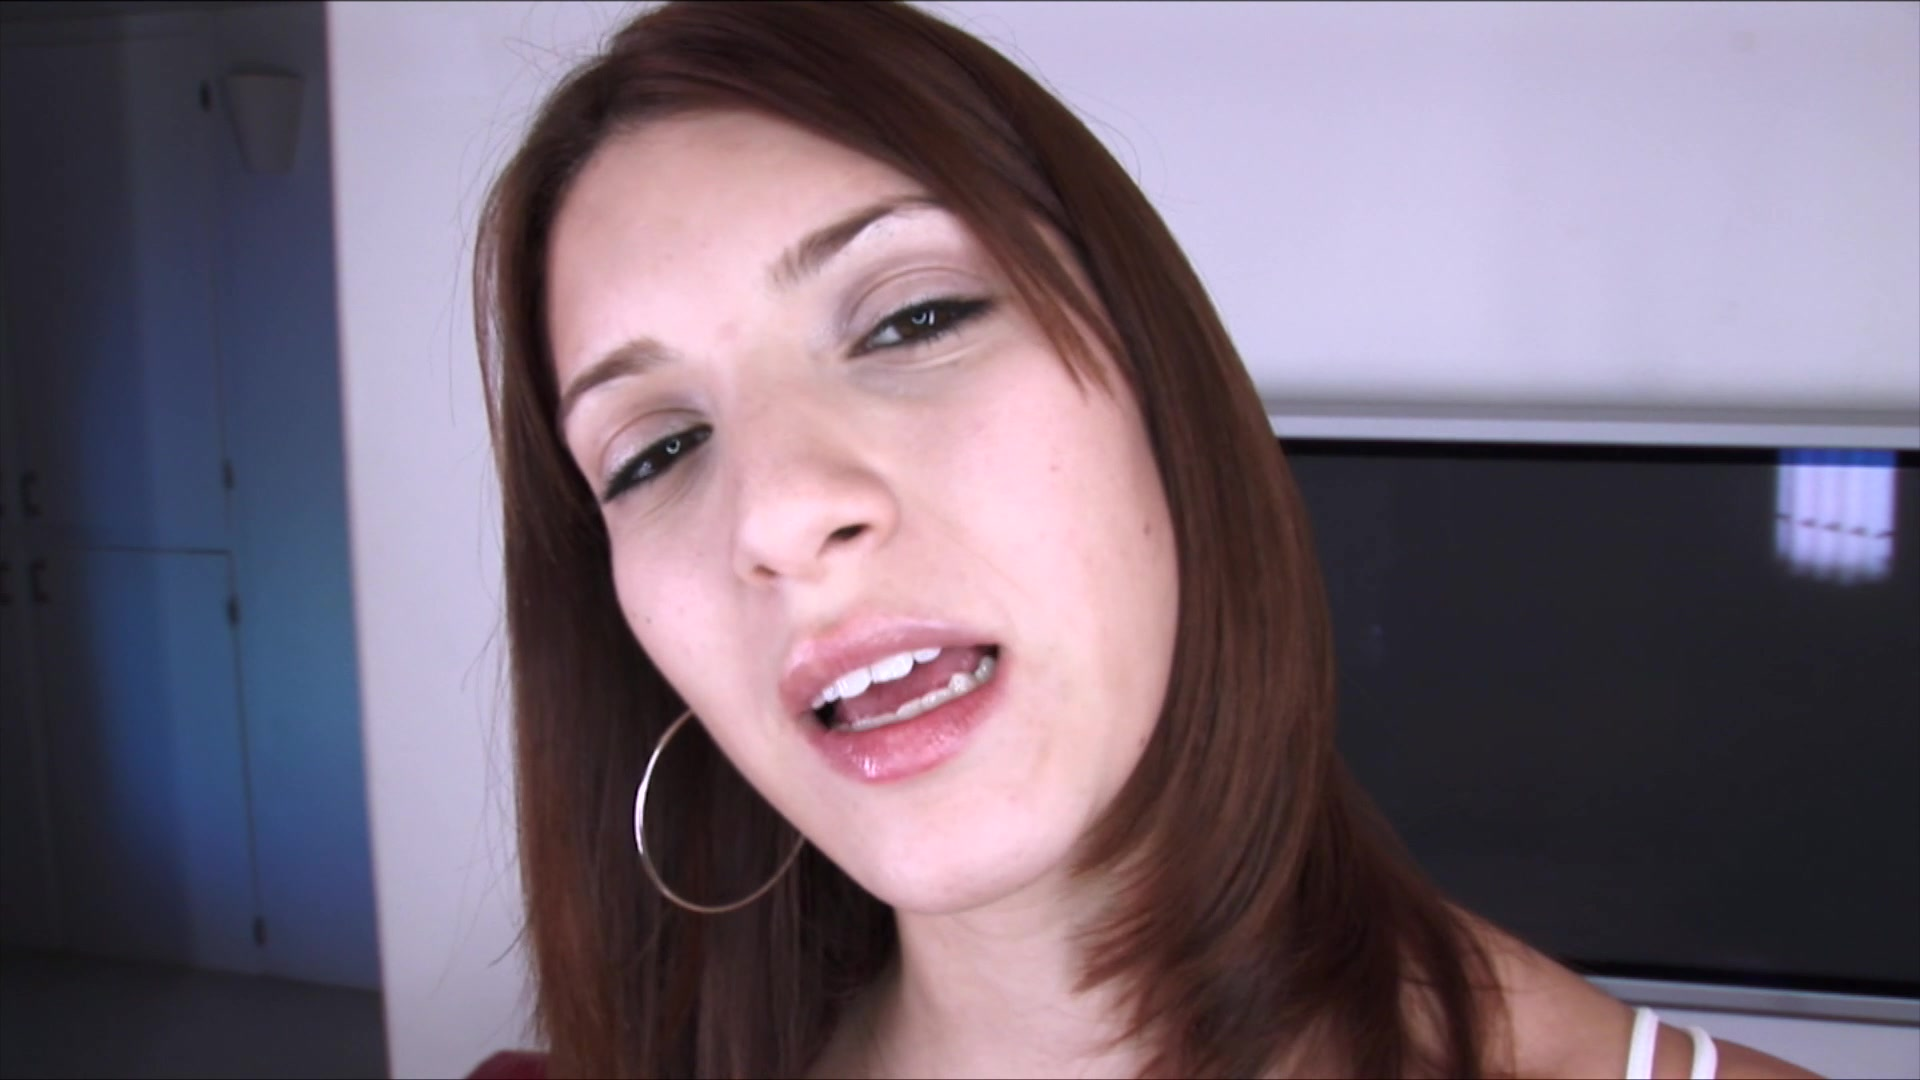 Marissa porn allure amateur